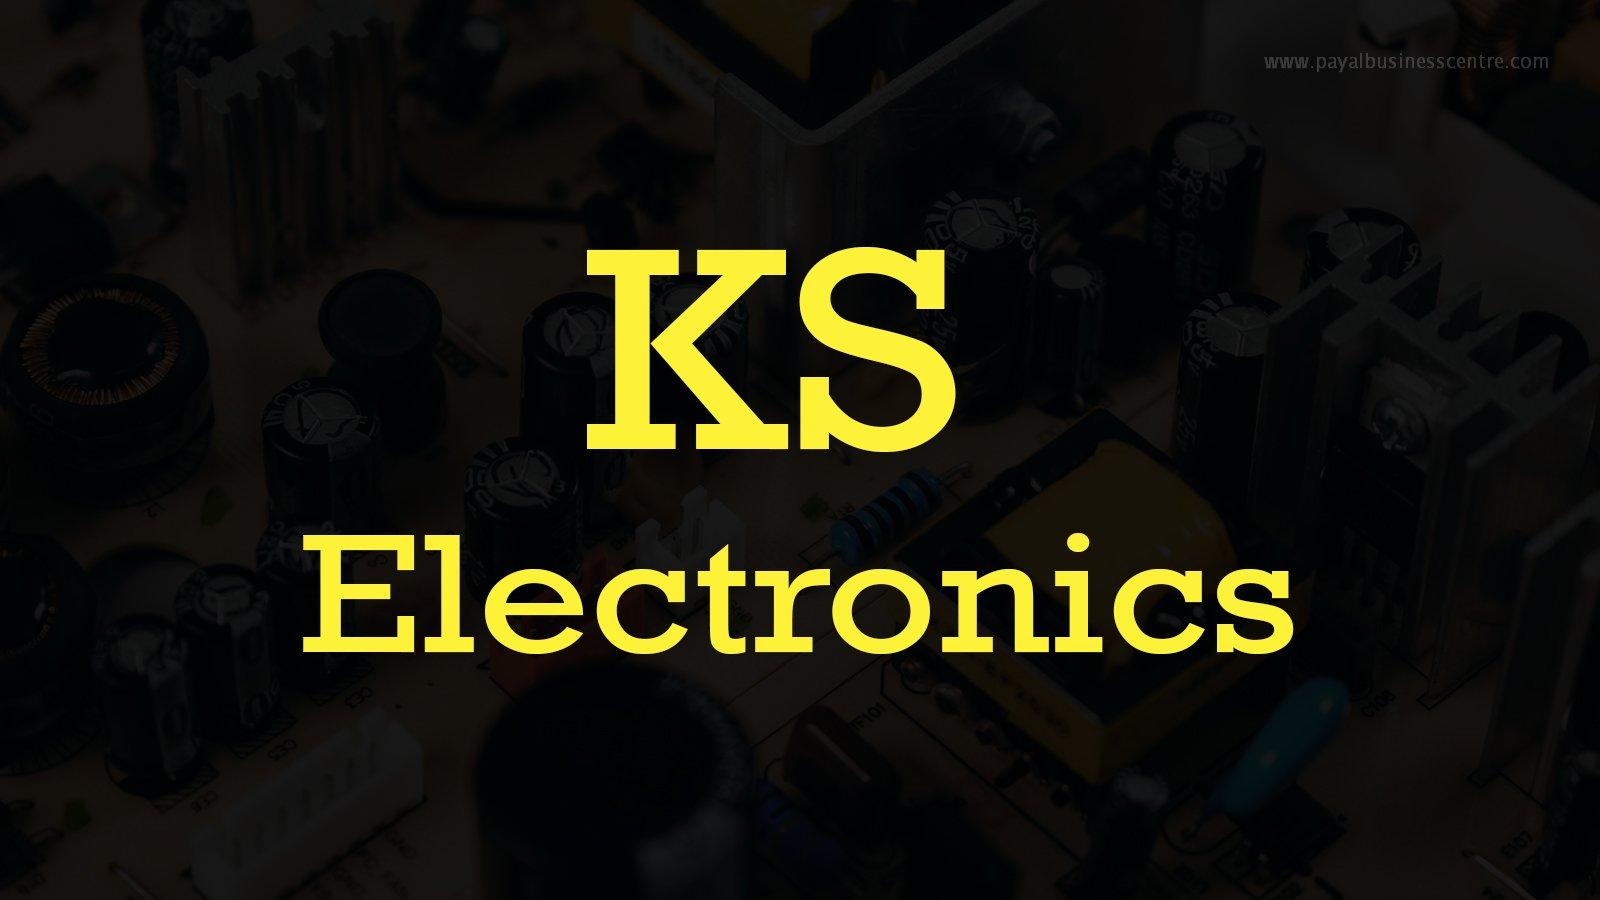 KS Electronics